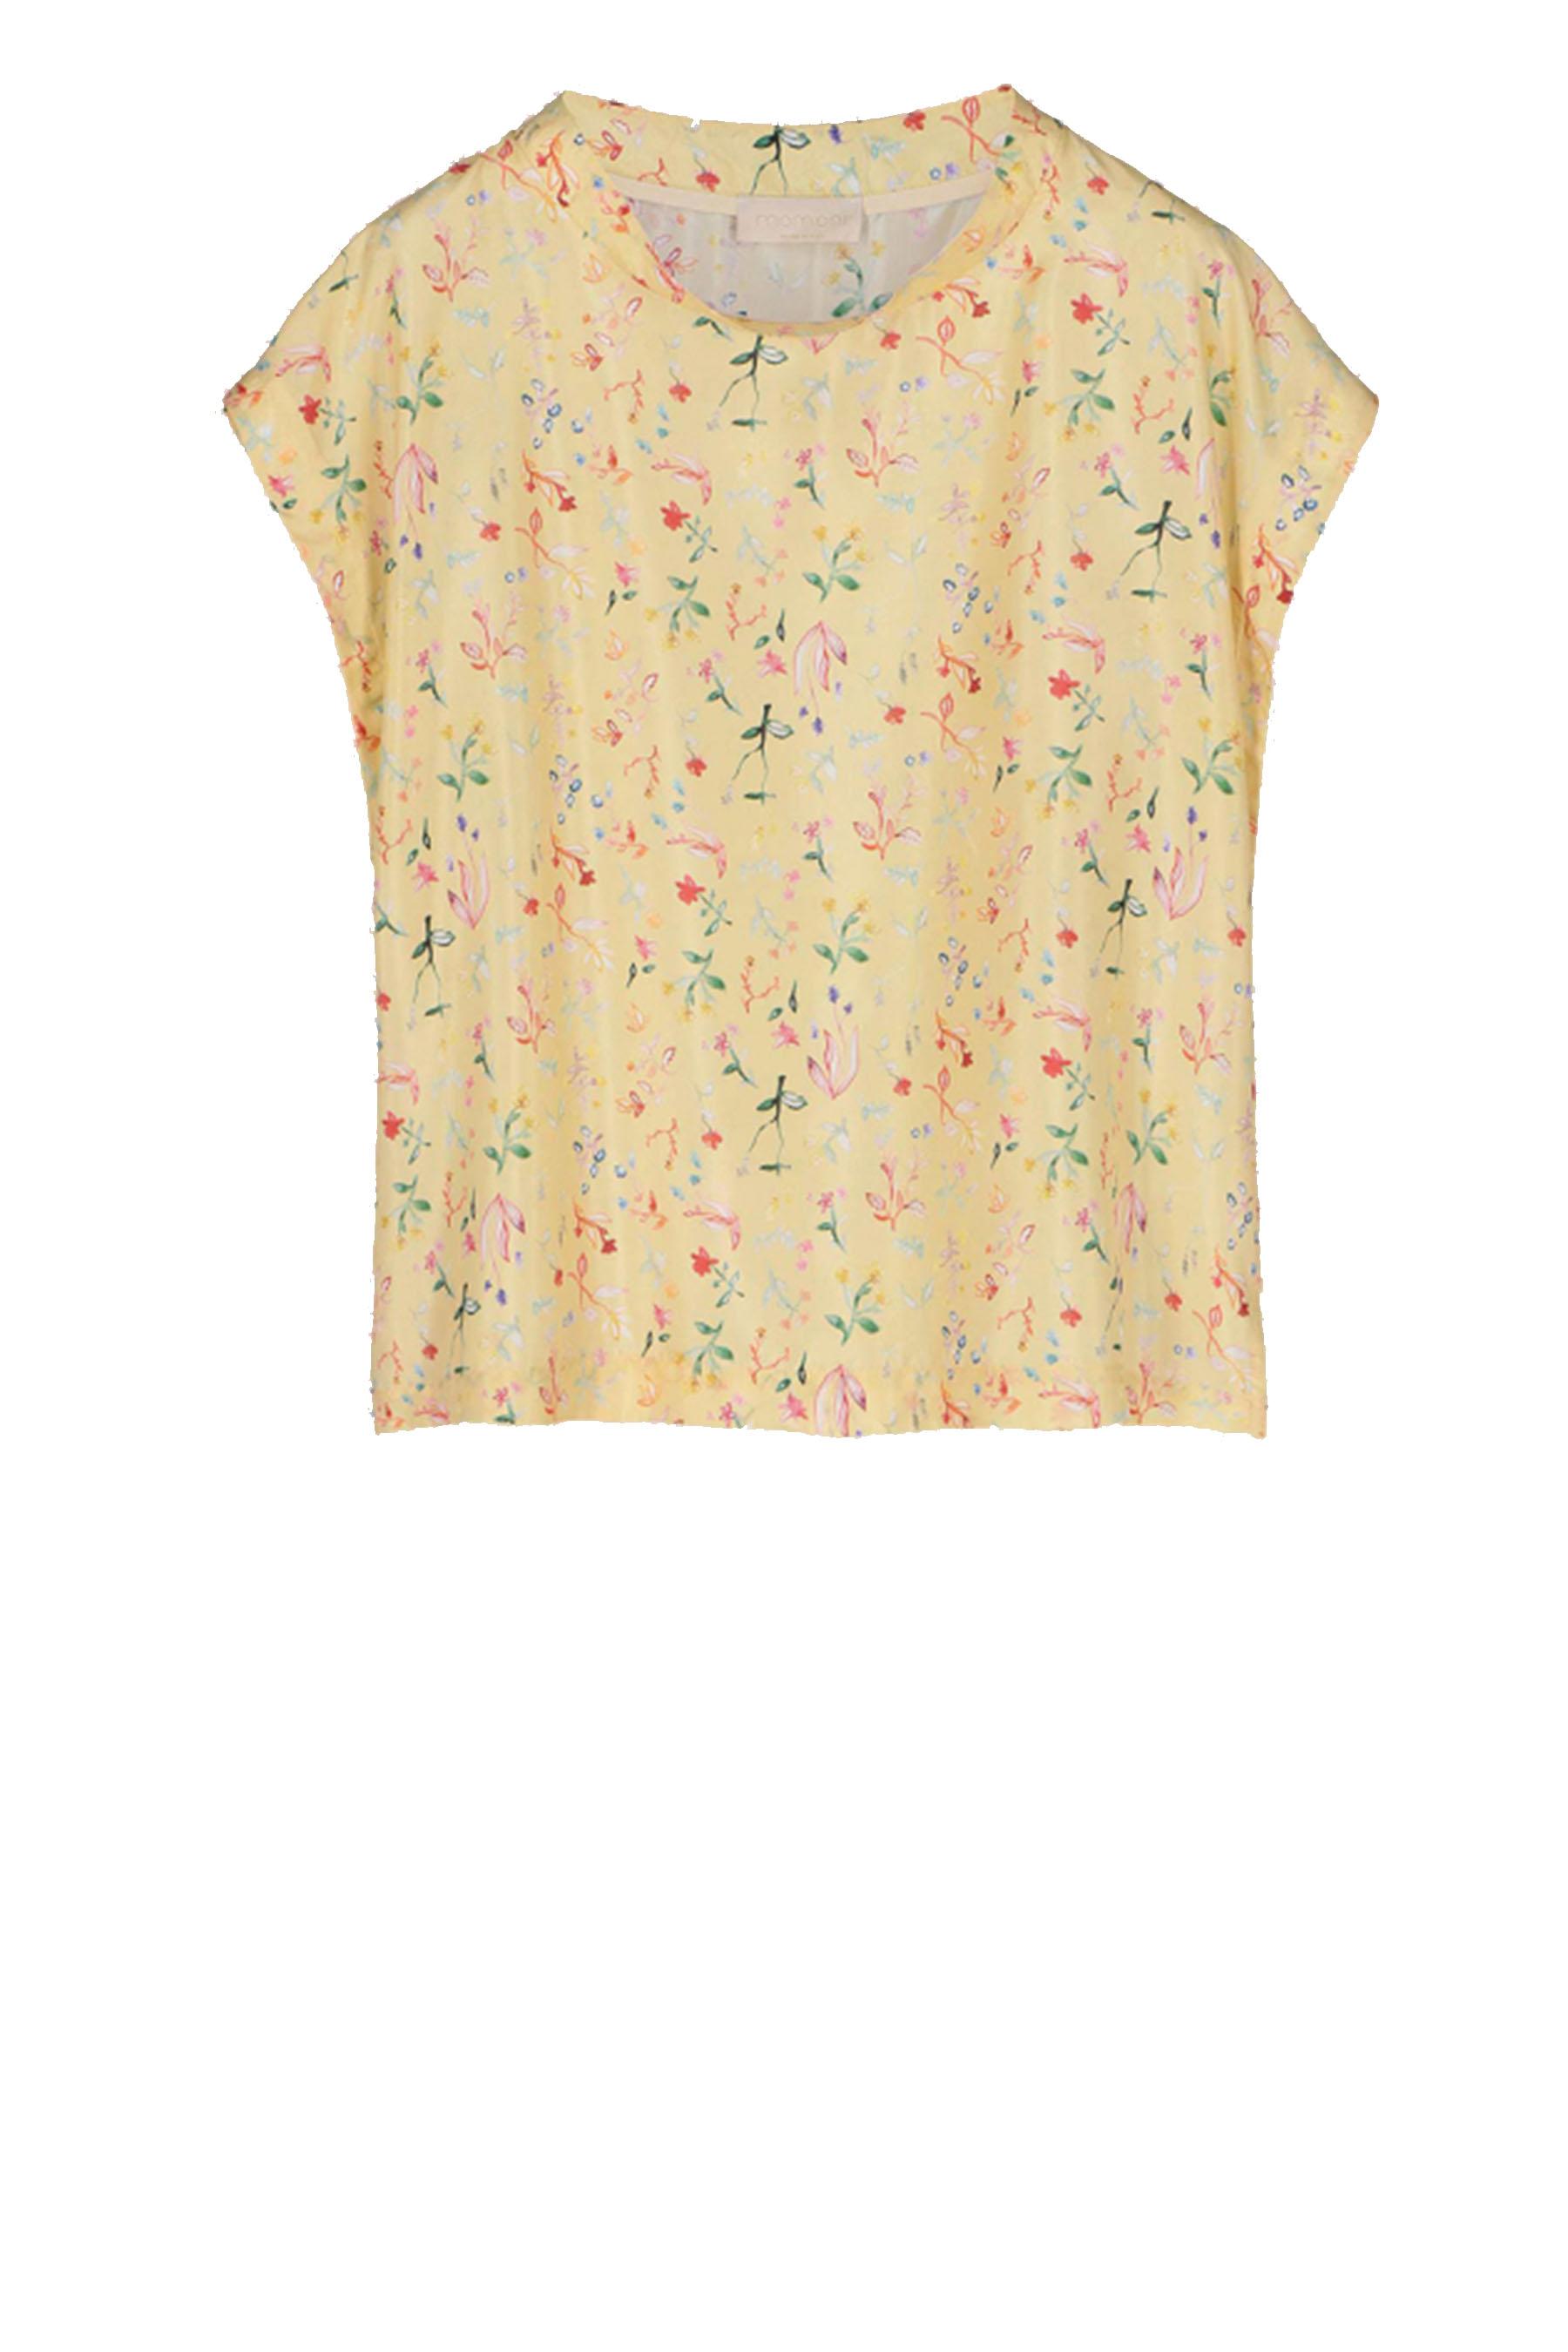 Sleeveless blouse in silk MOMONI | Blouses | MOBL004 03MO4020